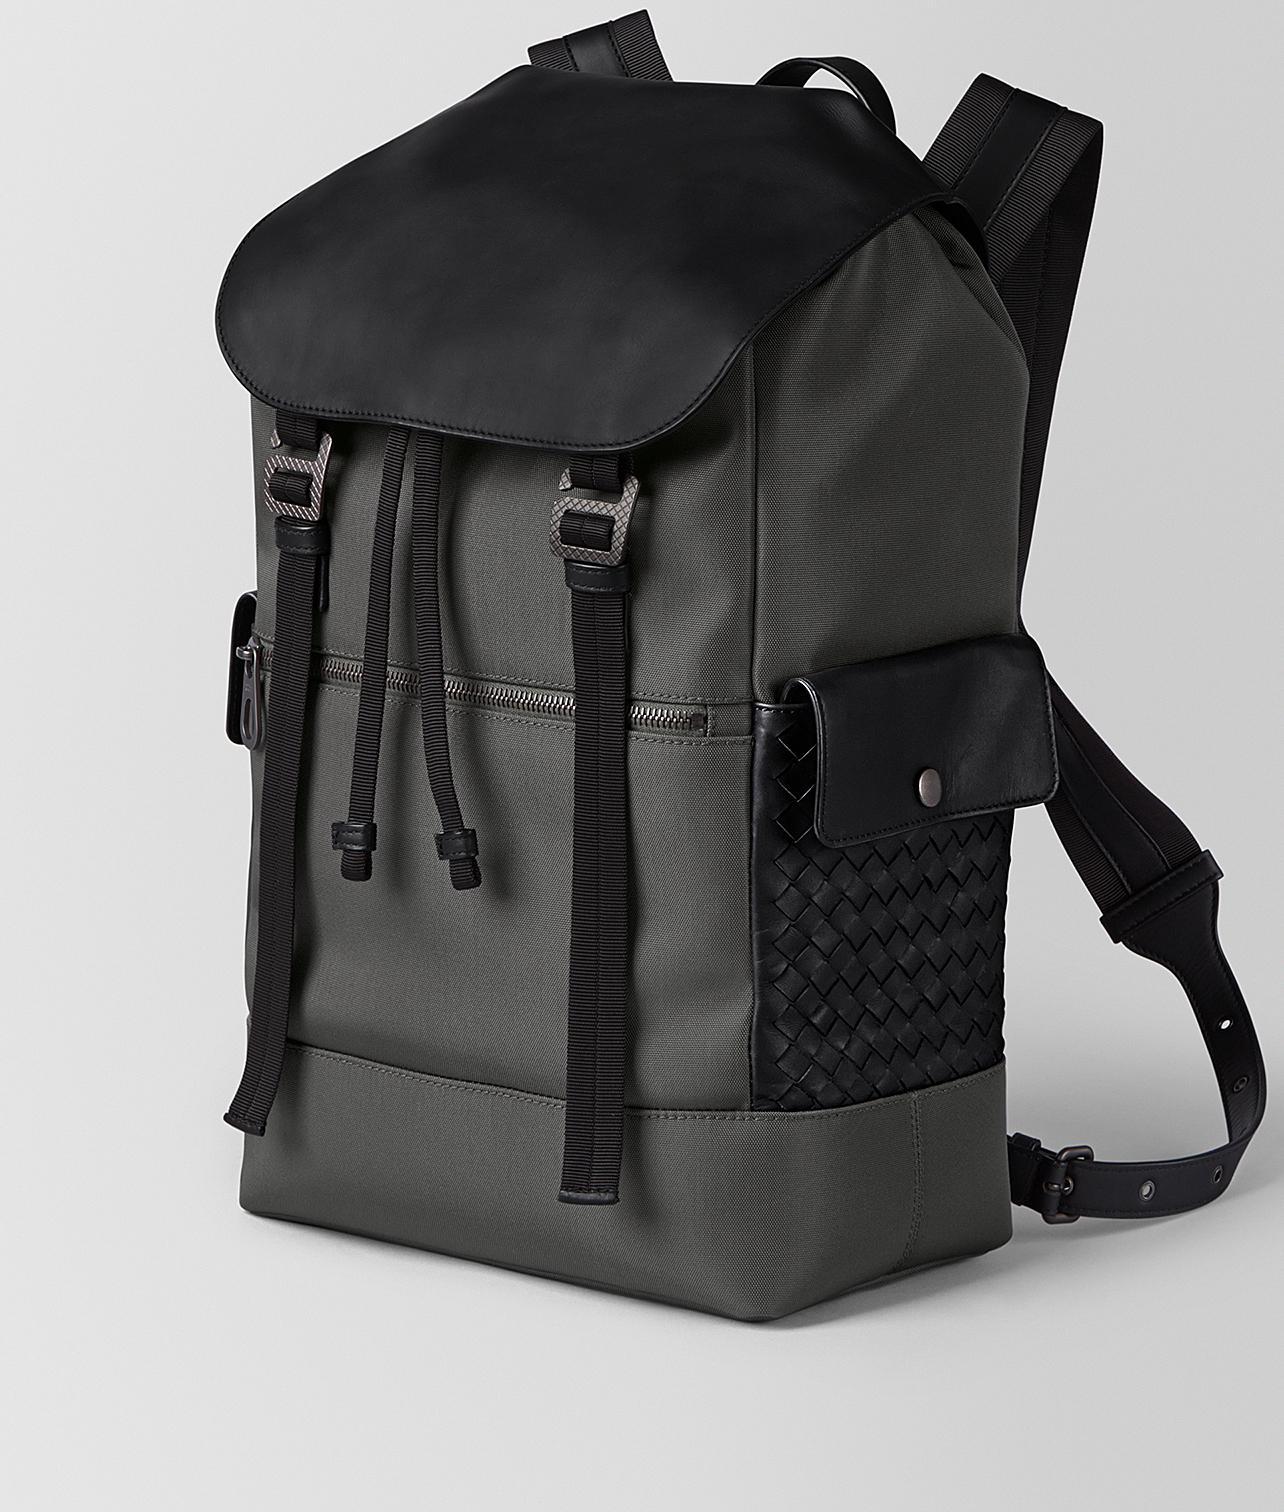 Lyst - Bottega Veneta Light Grey Hi-tech Canvas Sassolungo Backpack in Gray  for Men d4973f5150d45